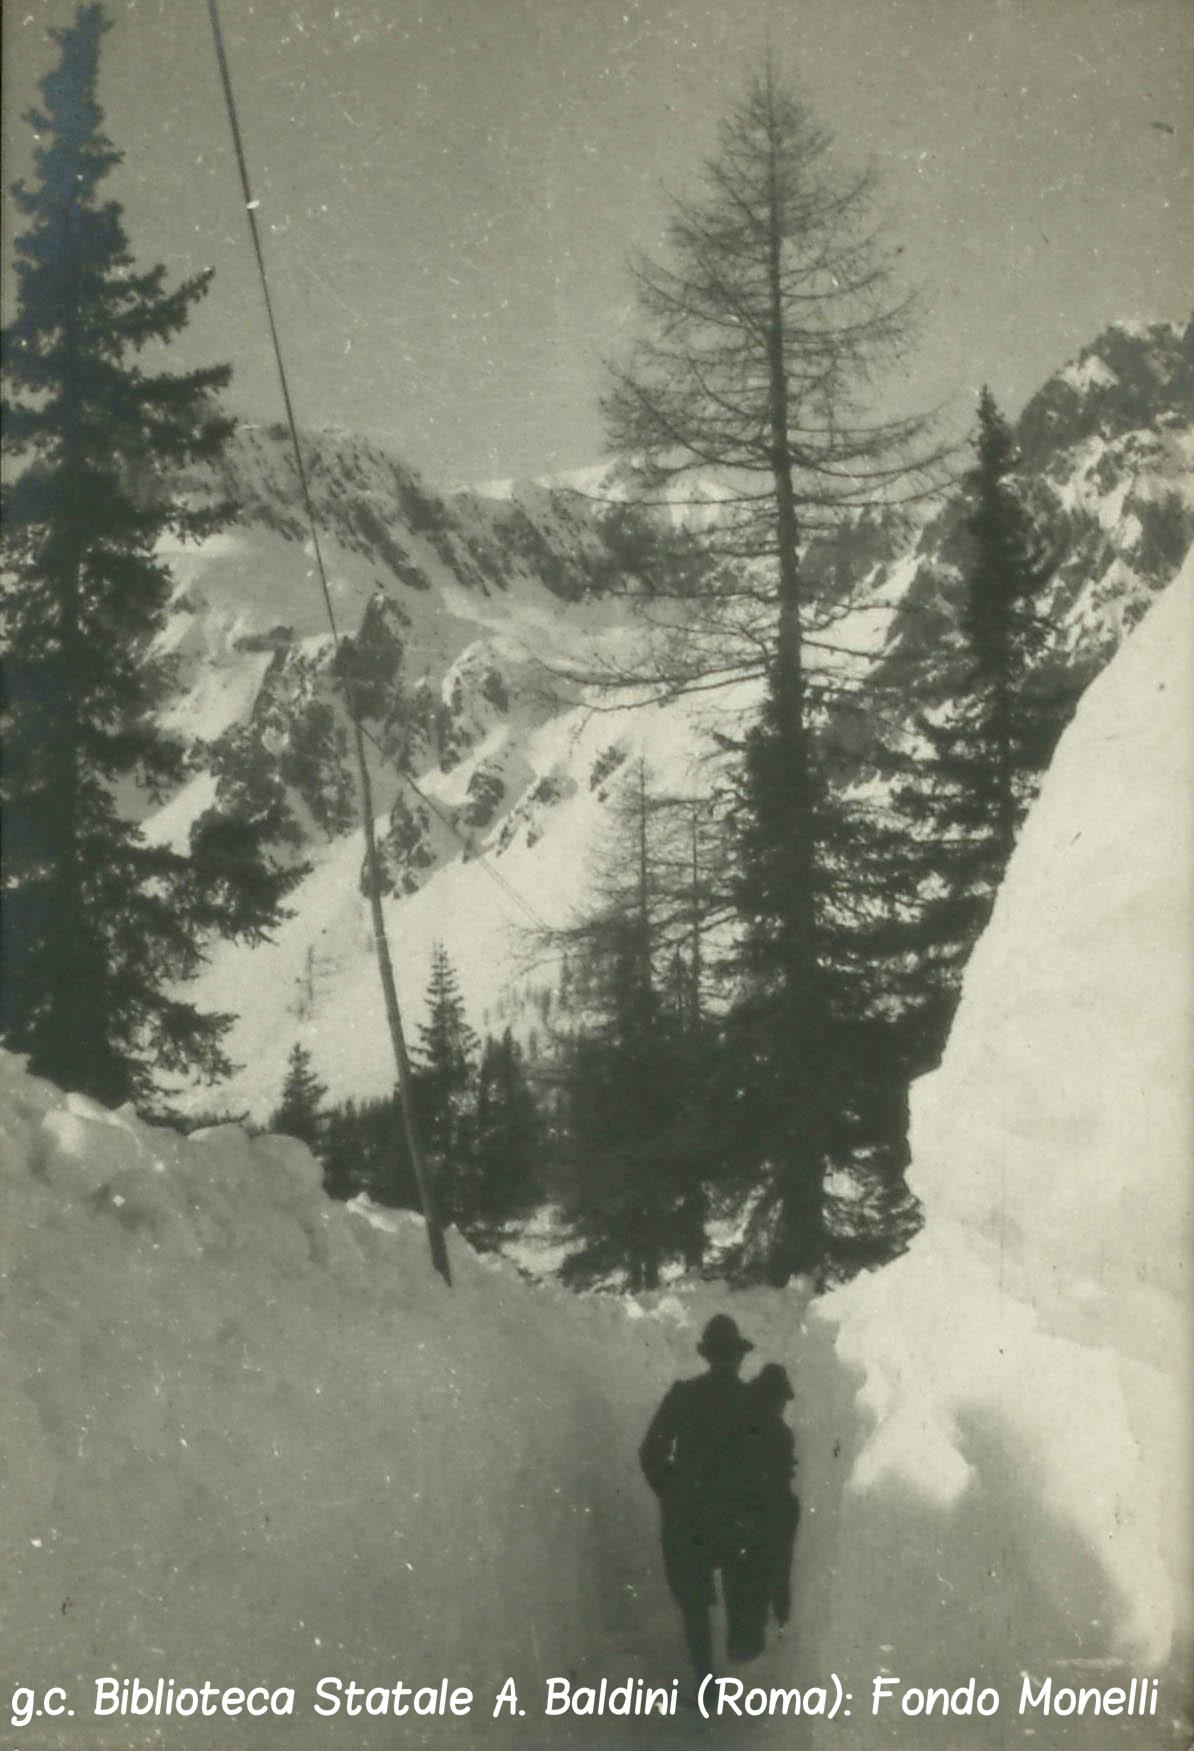 trincea scavata sulla neve.jpg